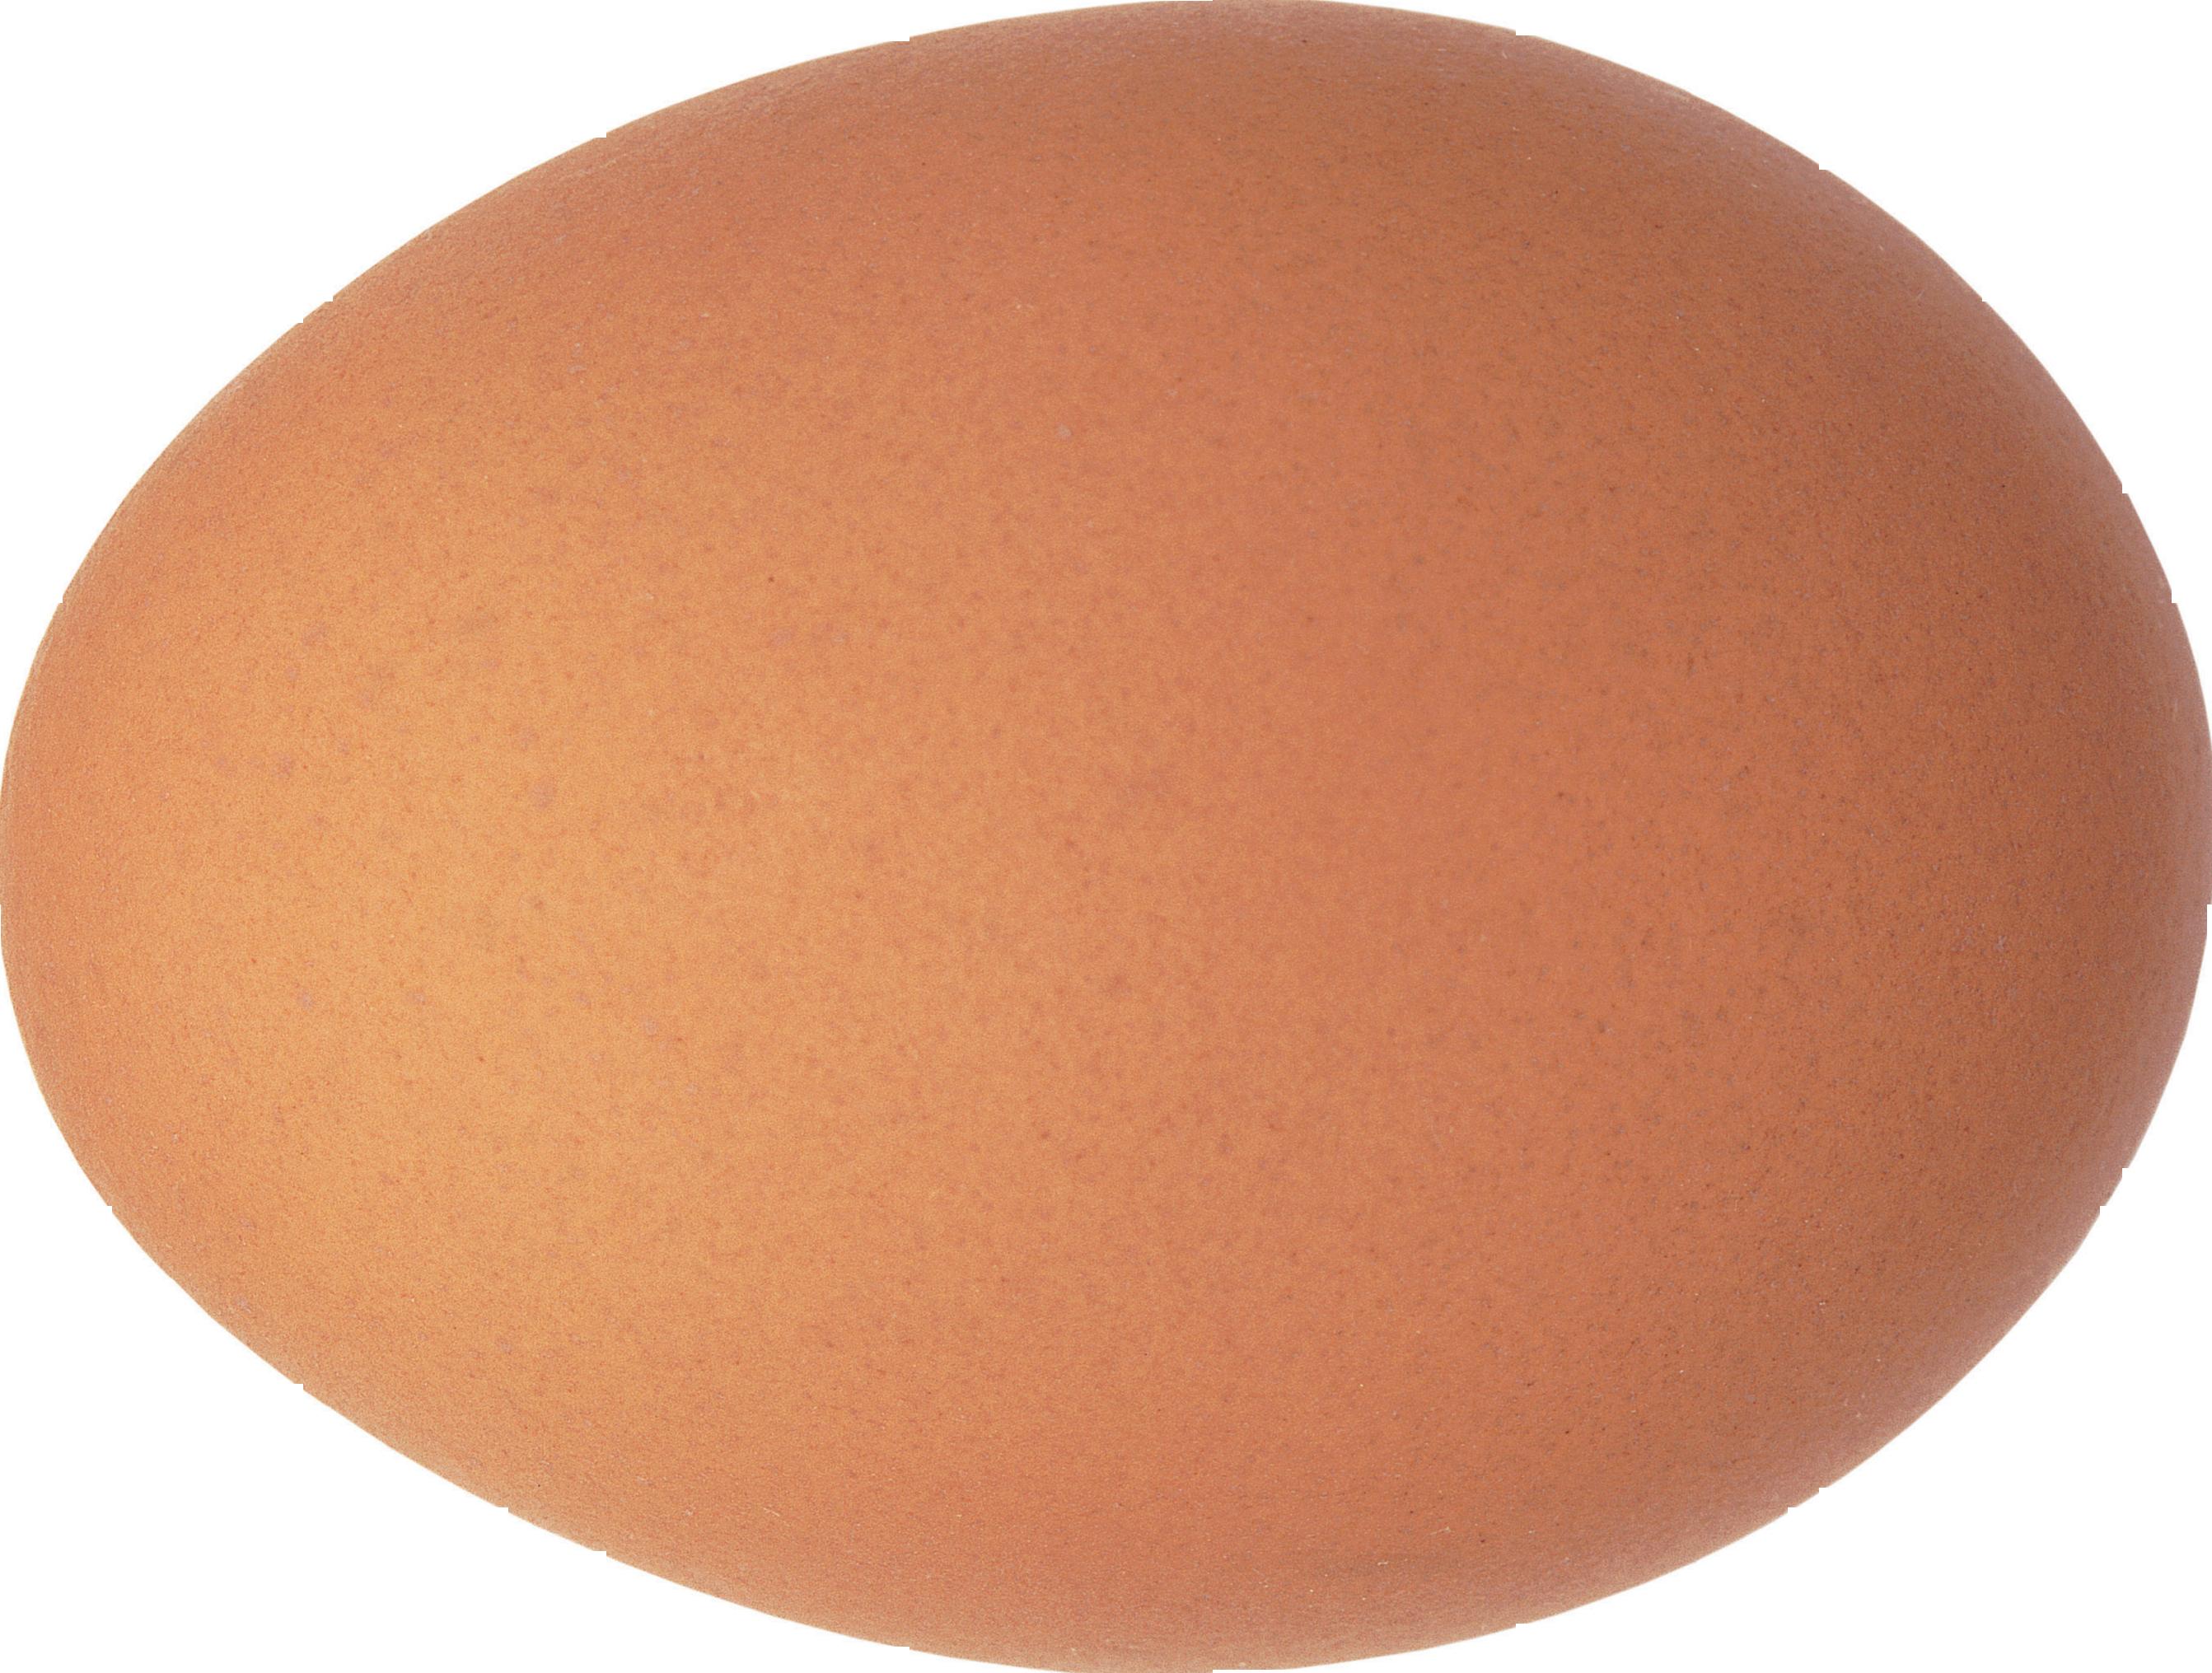 Fruit clipart egg. Ten isolated stock photo